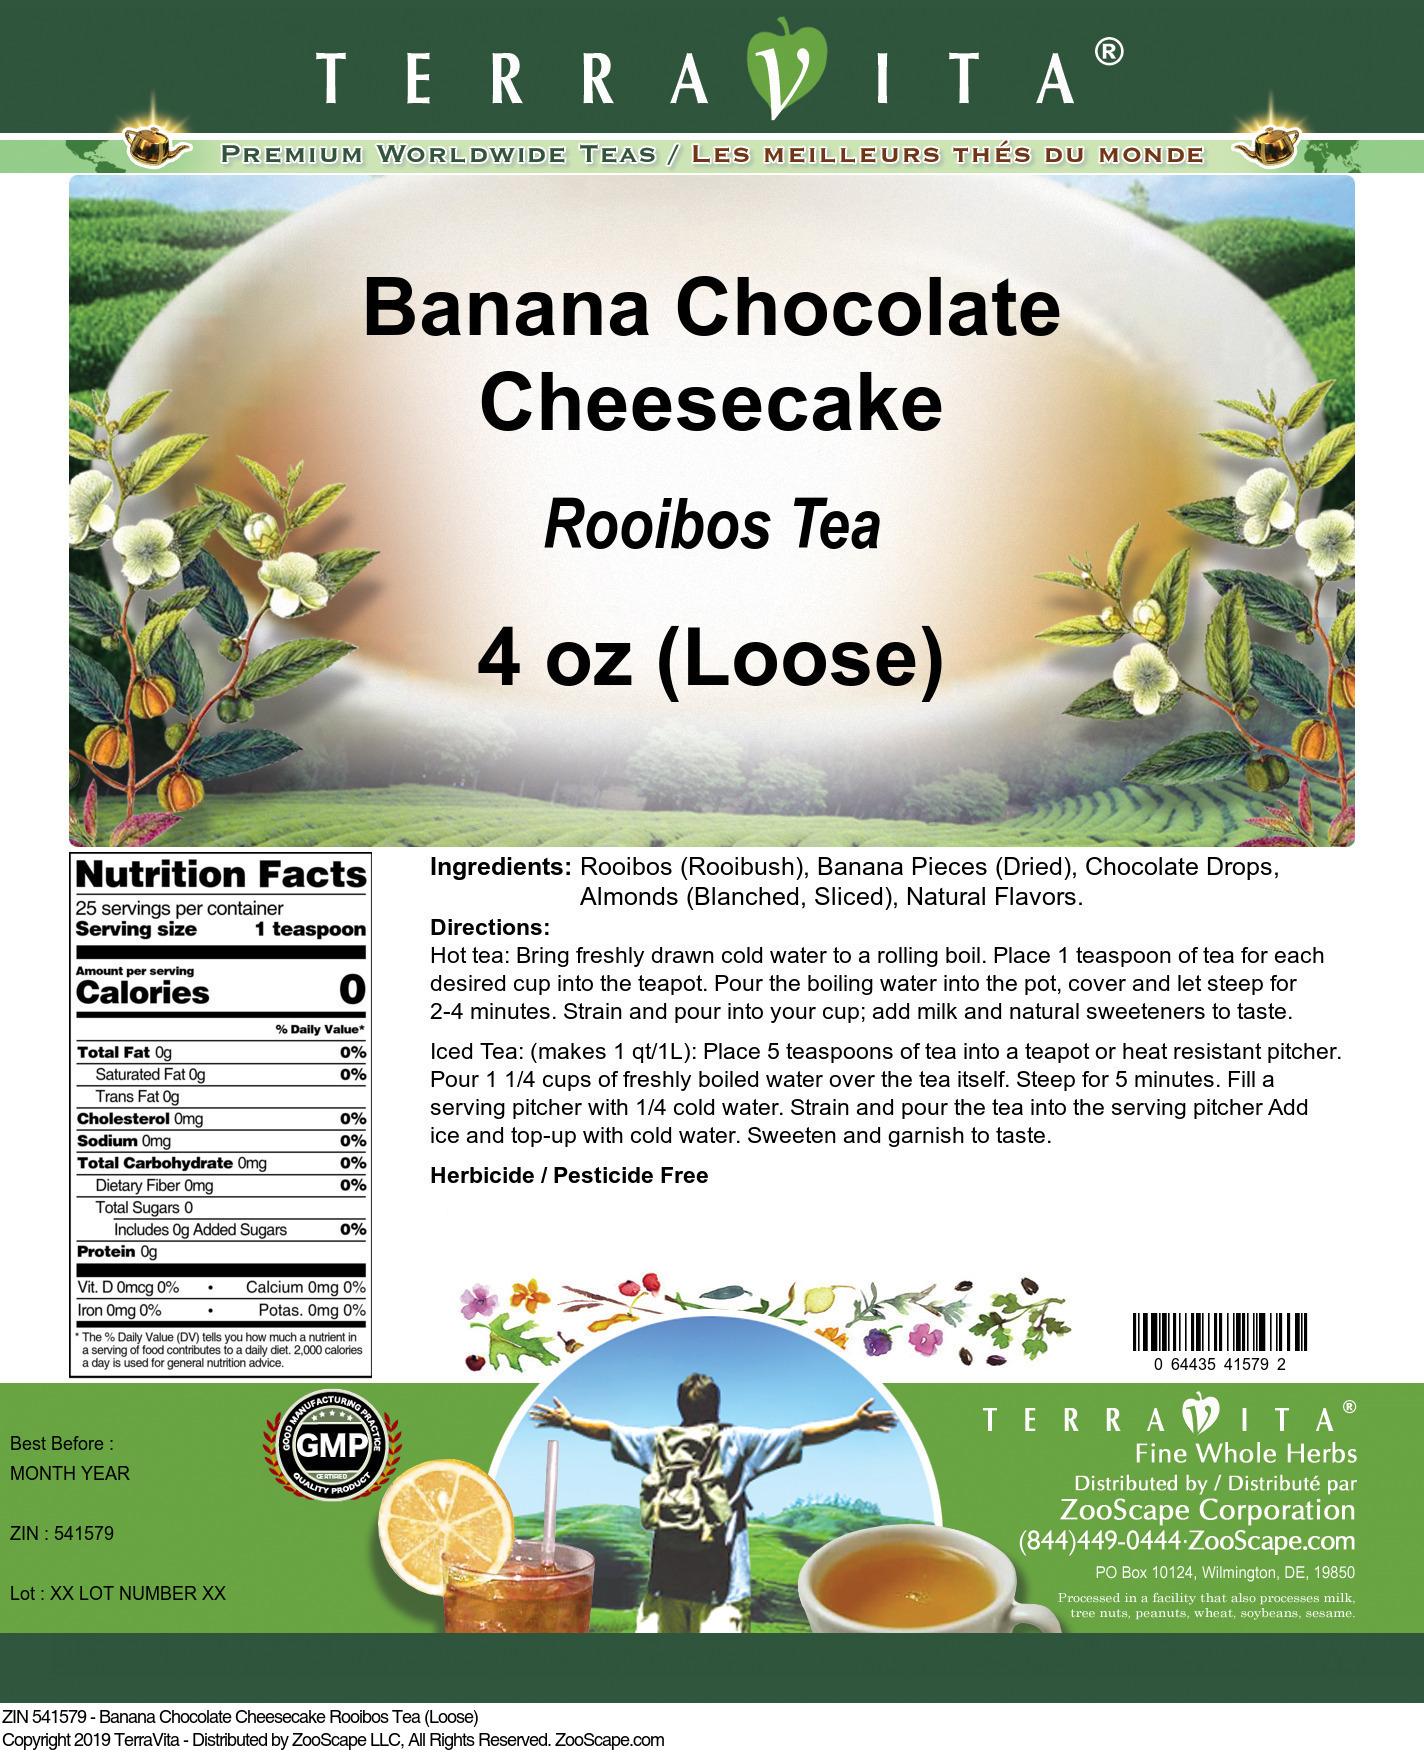 Banana Chocolate Cheesecake Rooibos Tea (Loose)